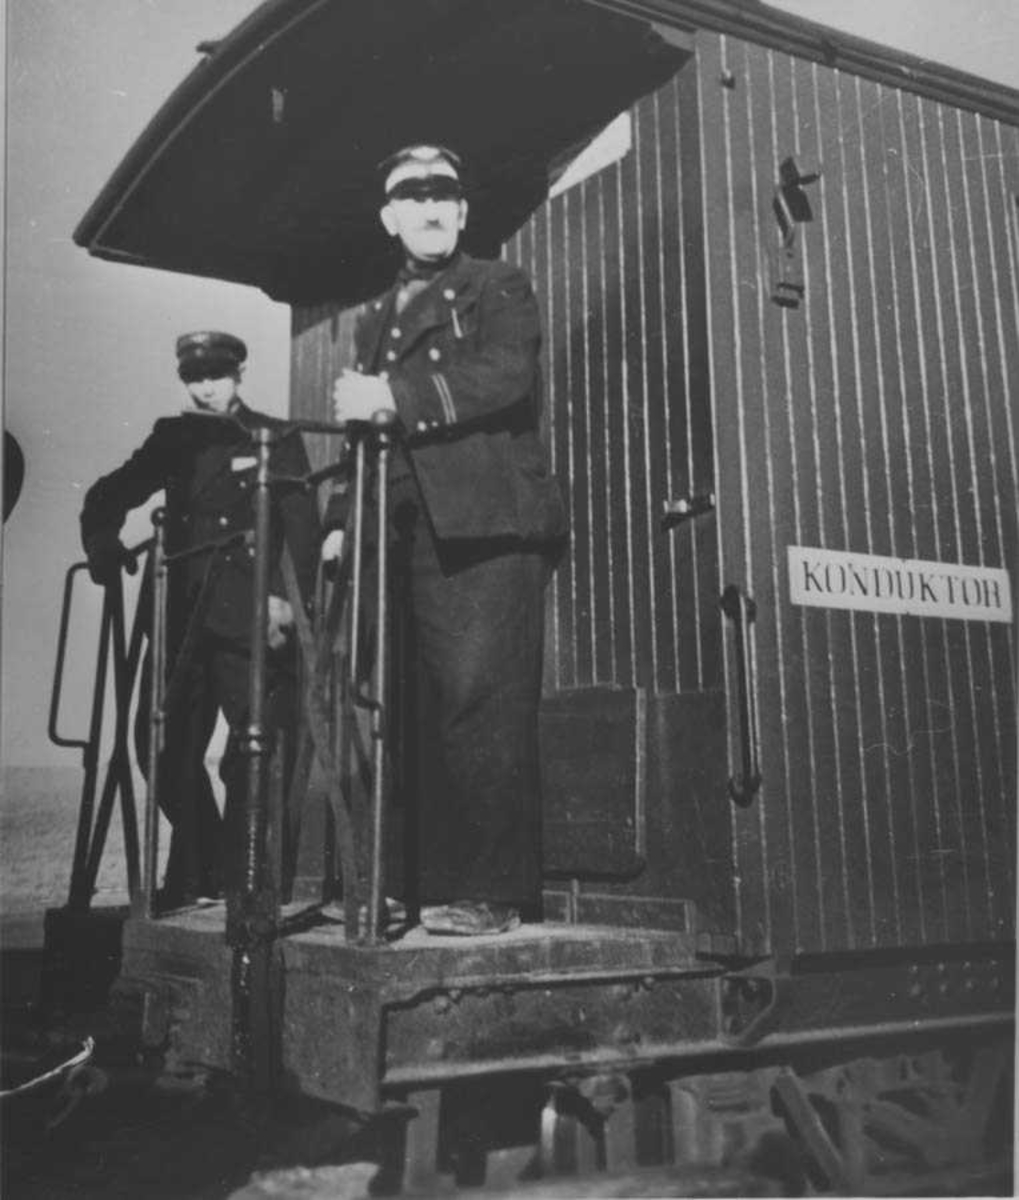 Konduktørpersonalet på bremseplattformen på vogn CFo6.